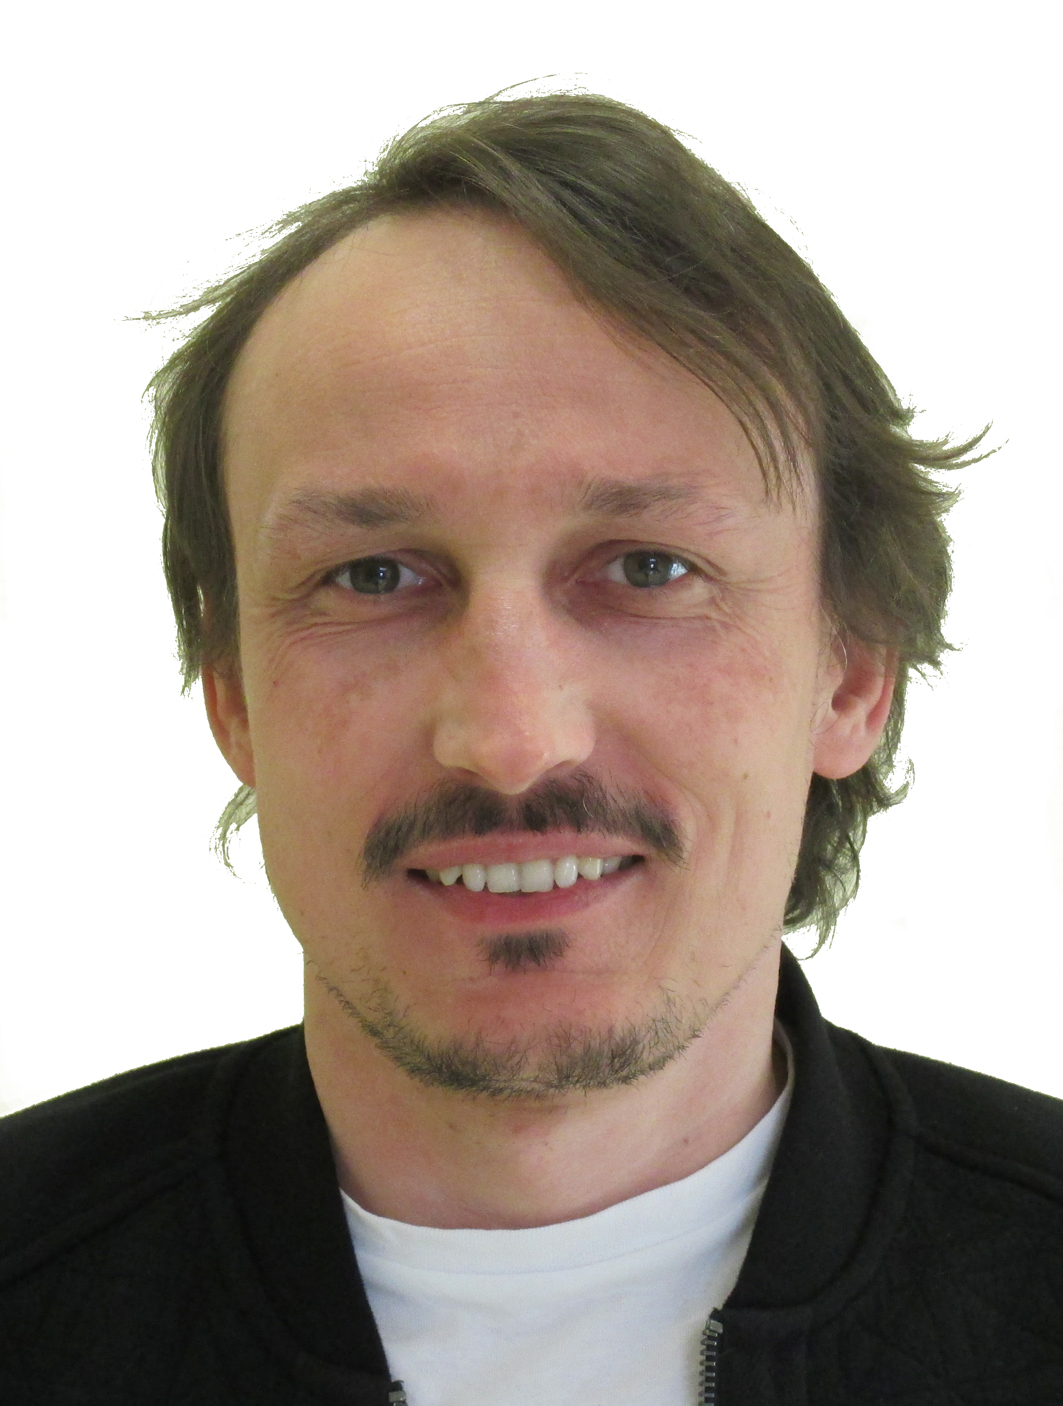 Pawel Adamiec